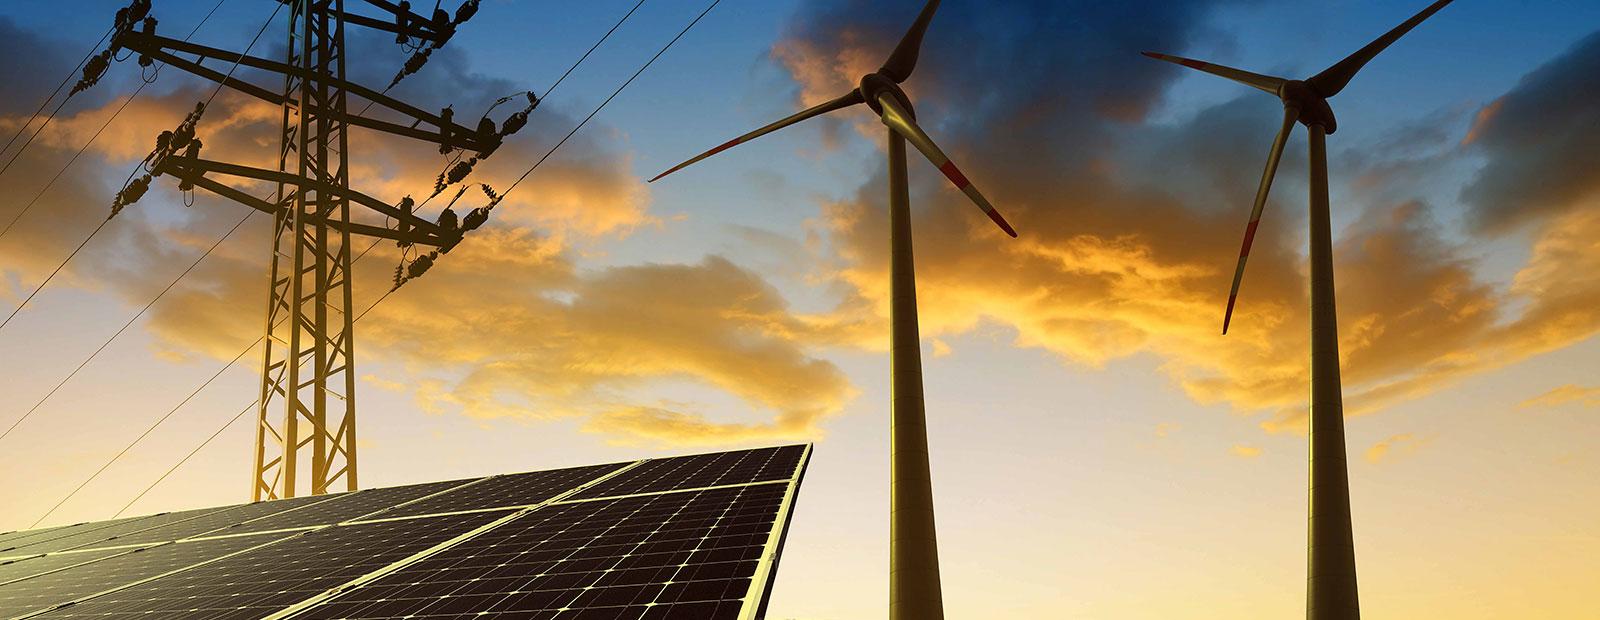 Khaitan, AZB act on Eversource, NIIF $330m investment in Ayana Renewable